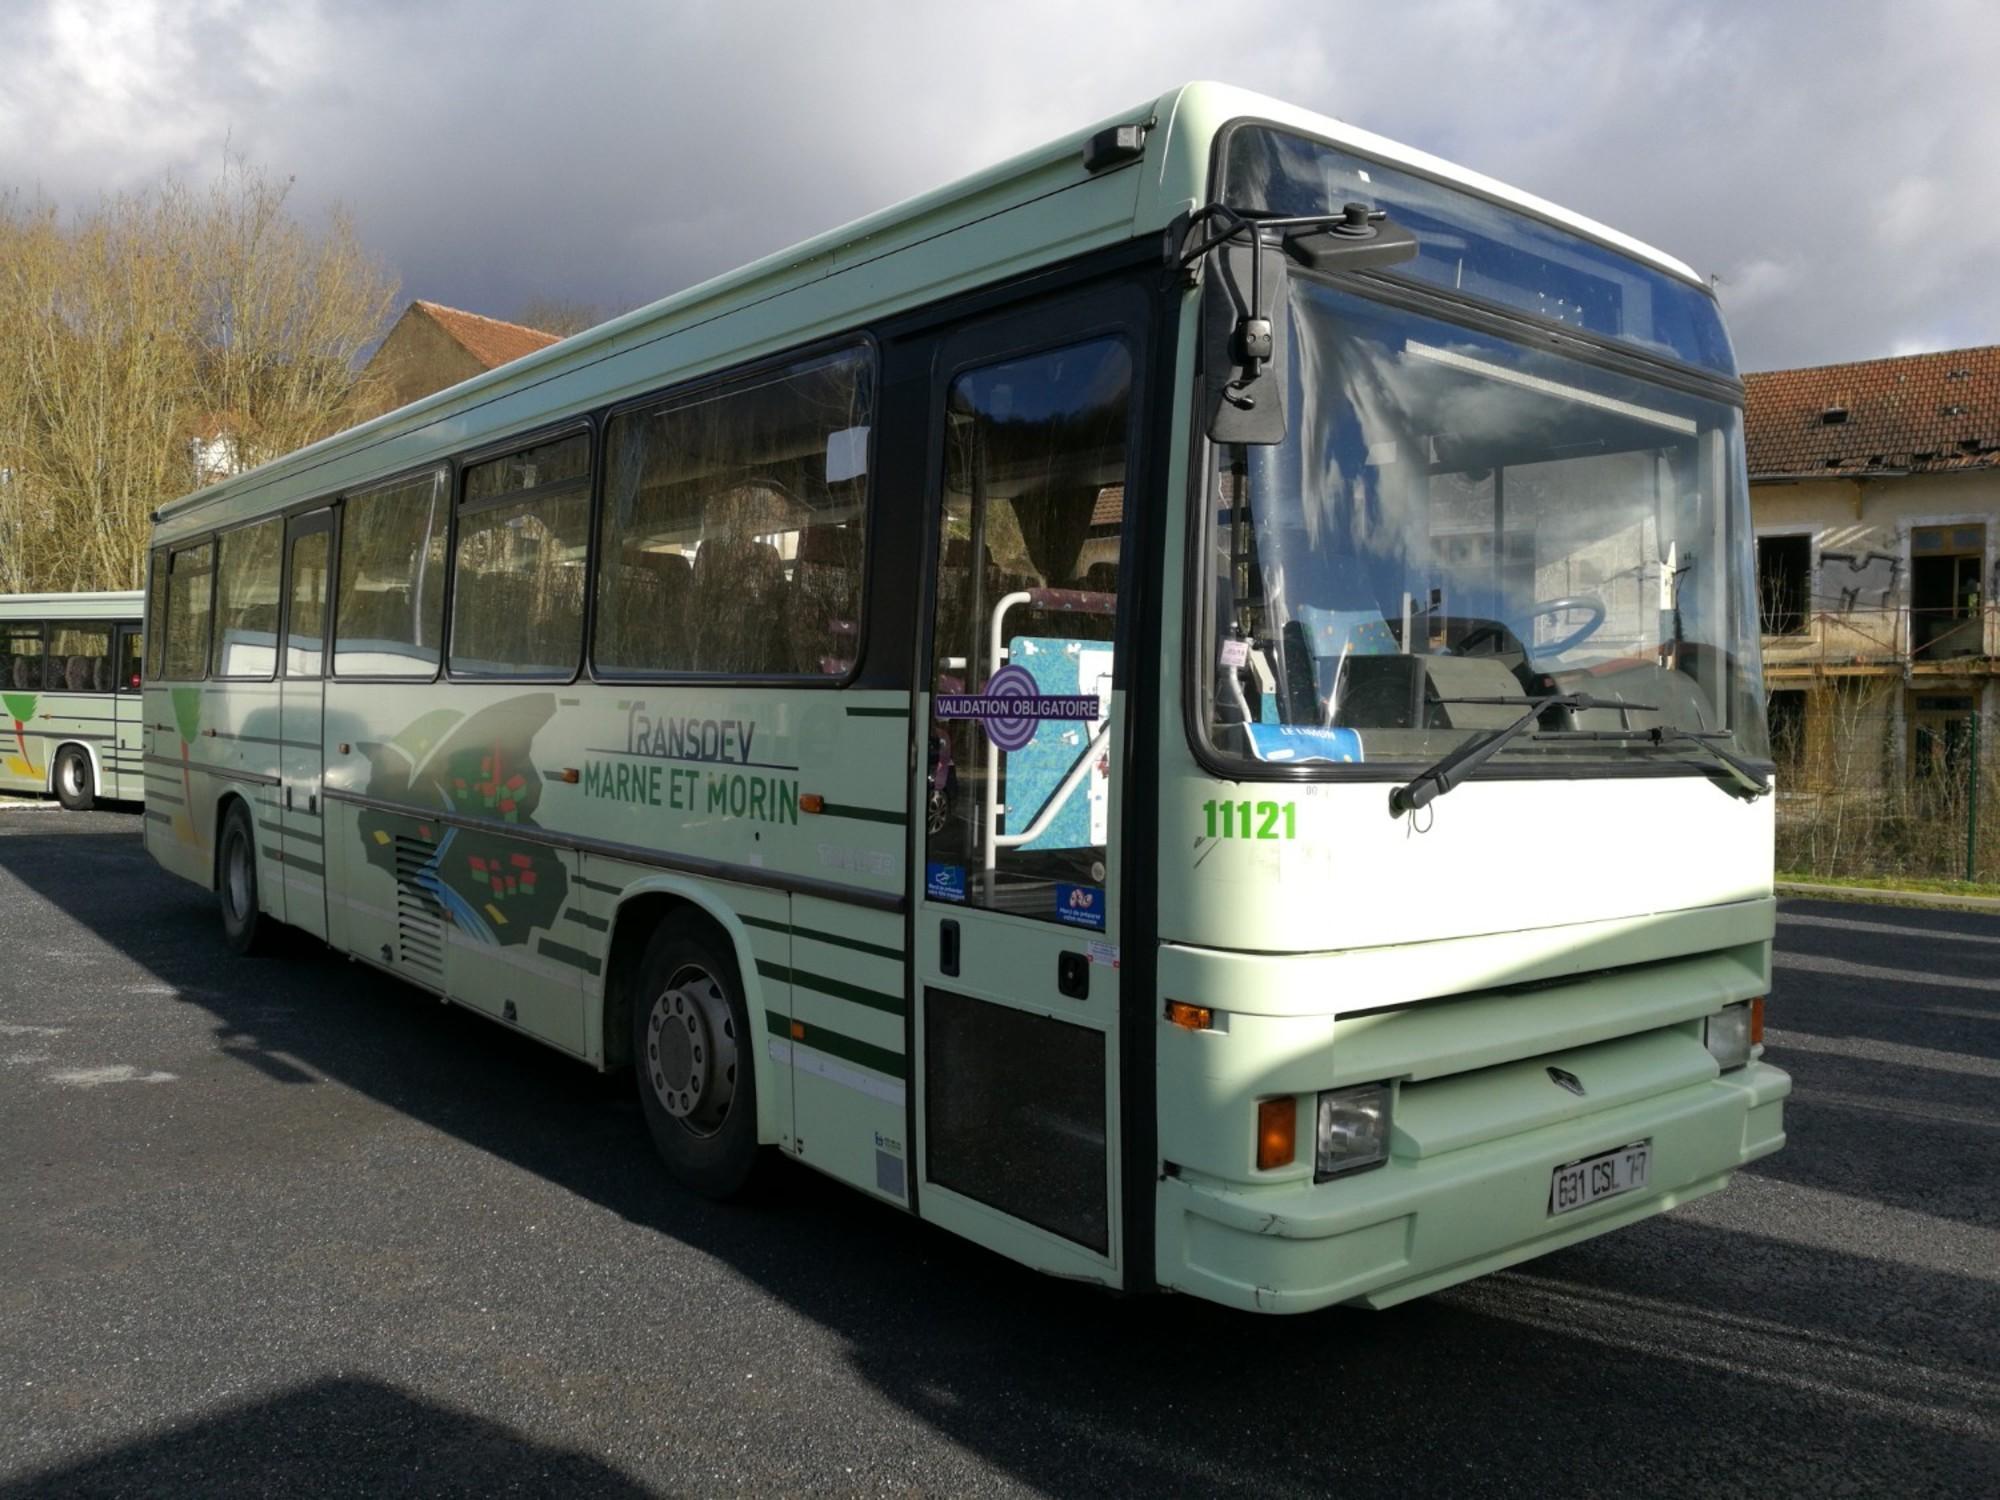 renault tracer 11121 car bus d 39 occasion aux ench res. Black Bedroom Furniture Sets. Home Design Ideas